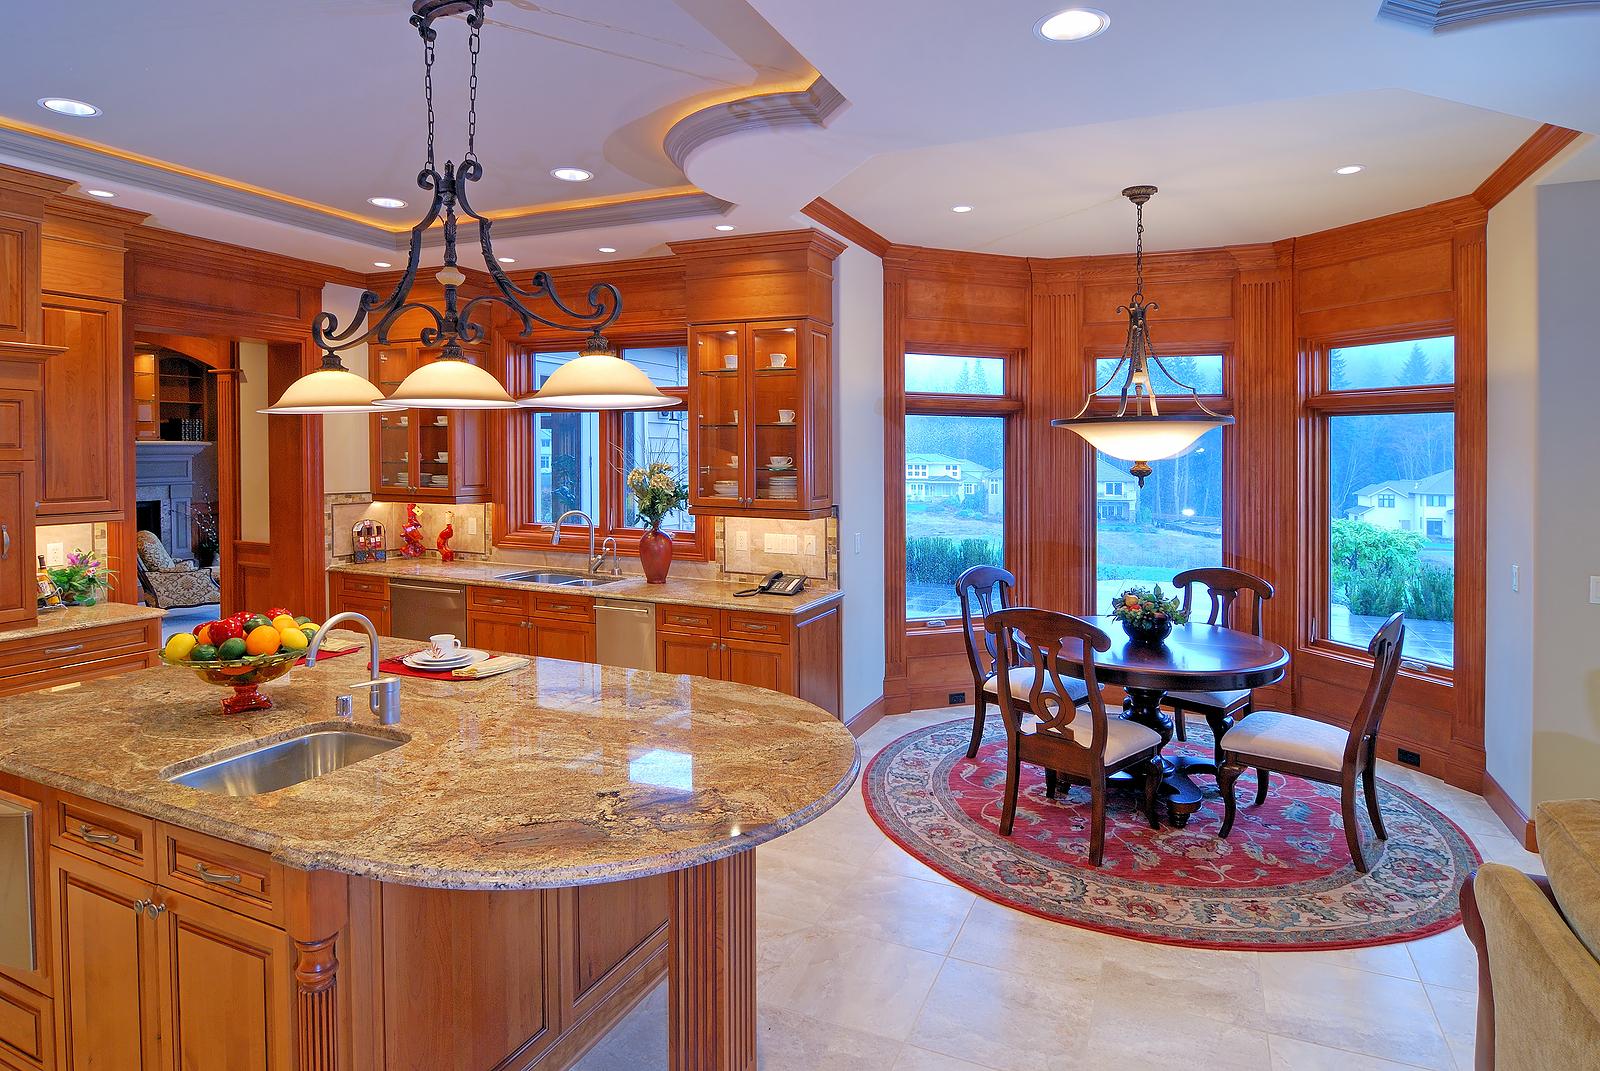 bigstock_Kitchen_And_Nook_1472771